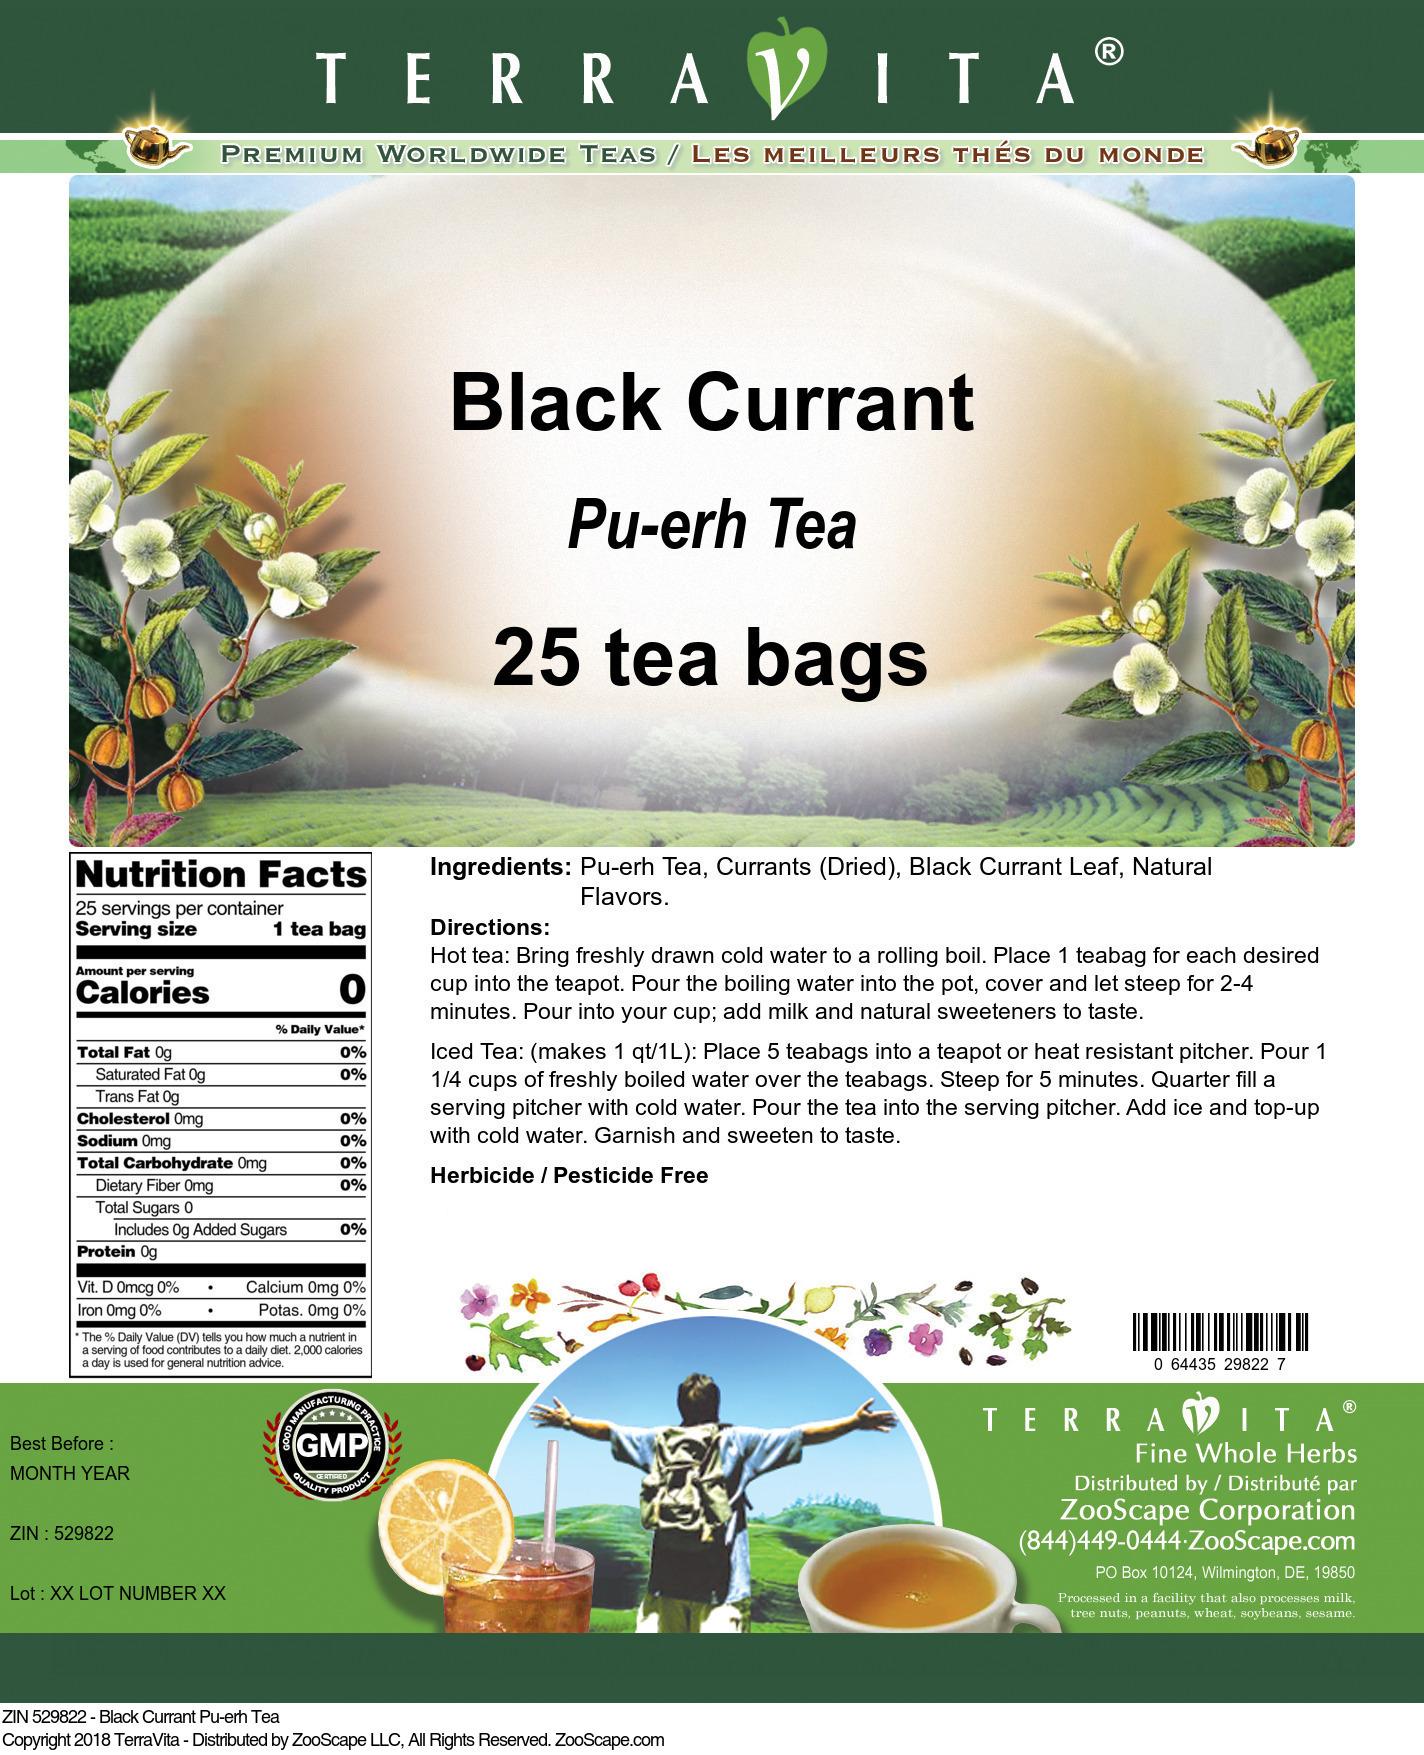 Black Currant Pu-erh Tea